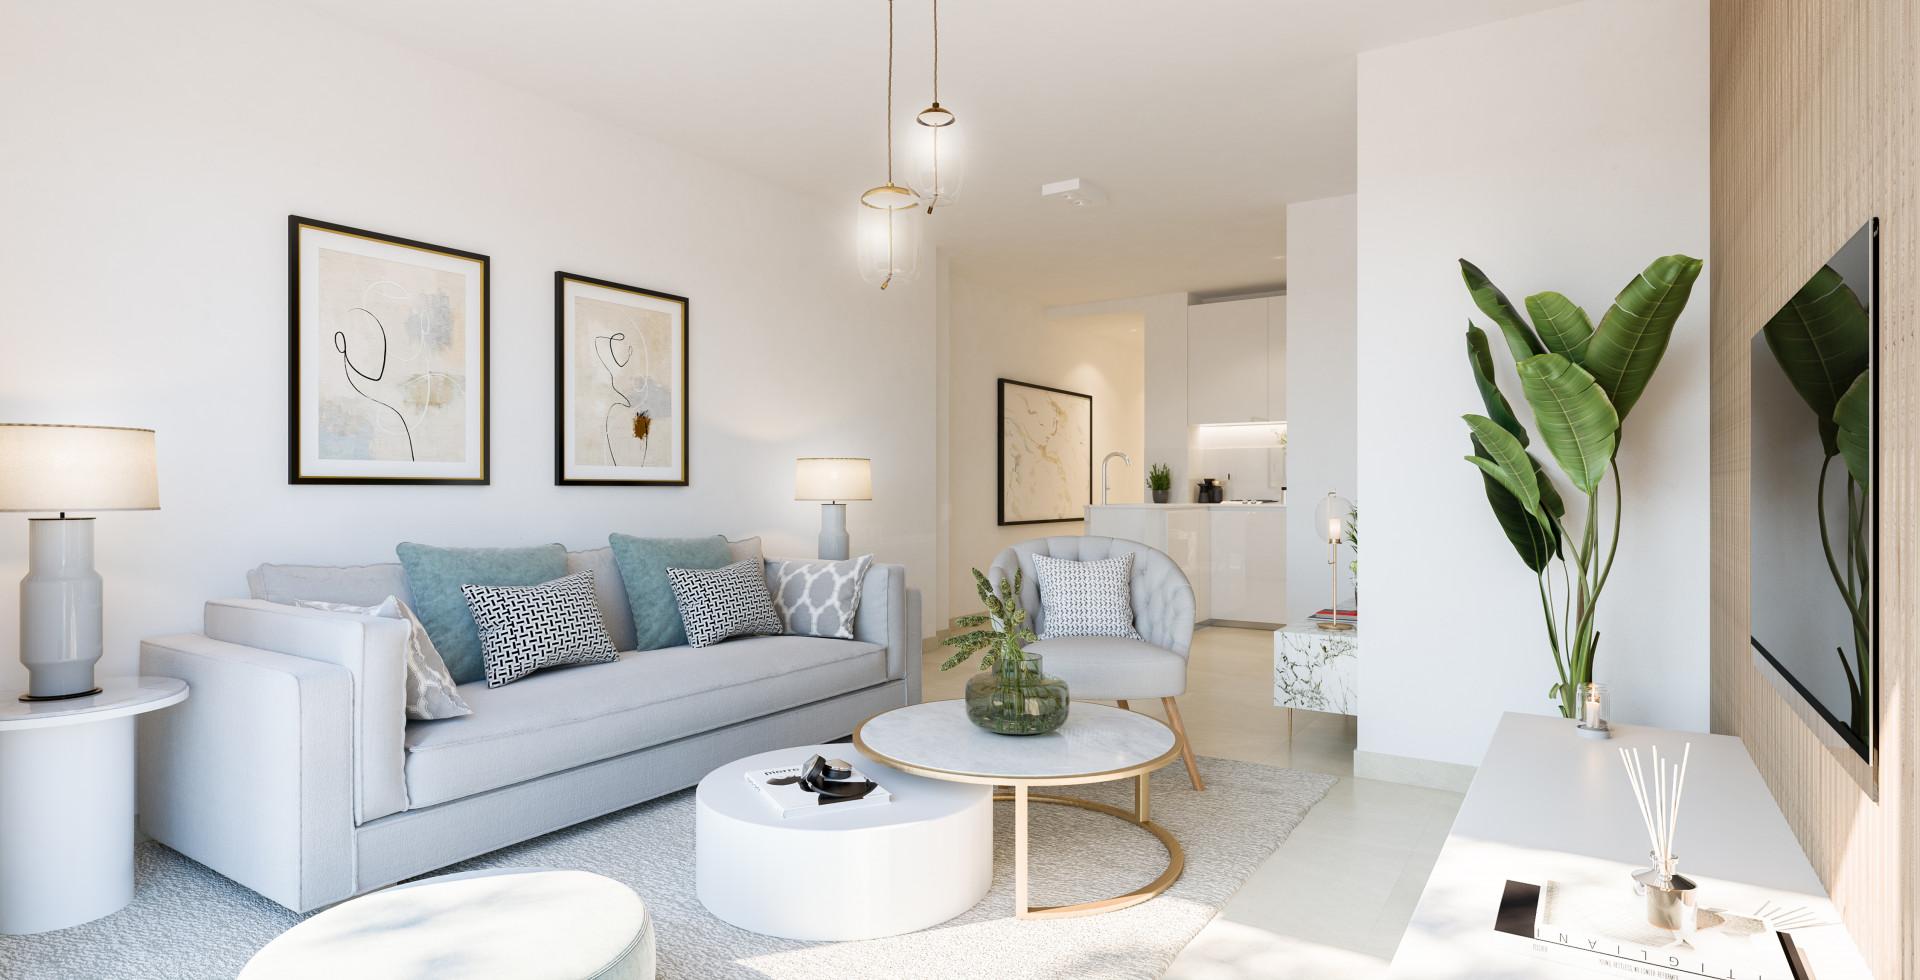 Apartment for sale in Fuengirola Centro, Fuengirola